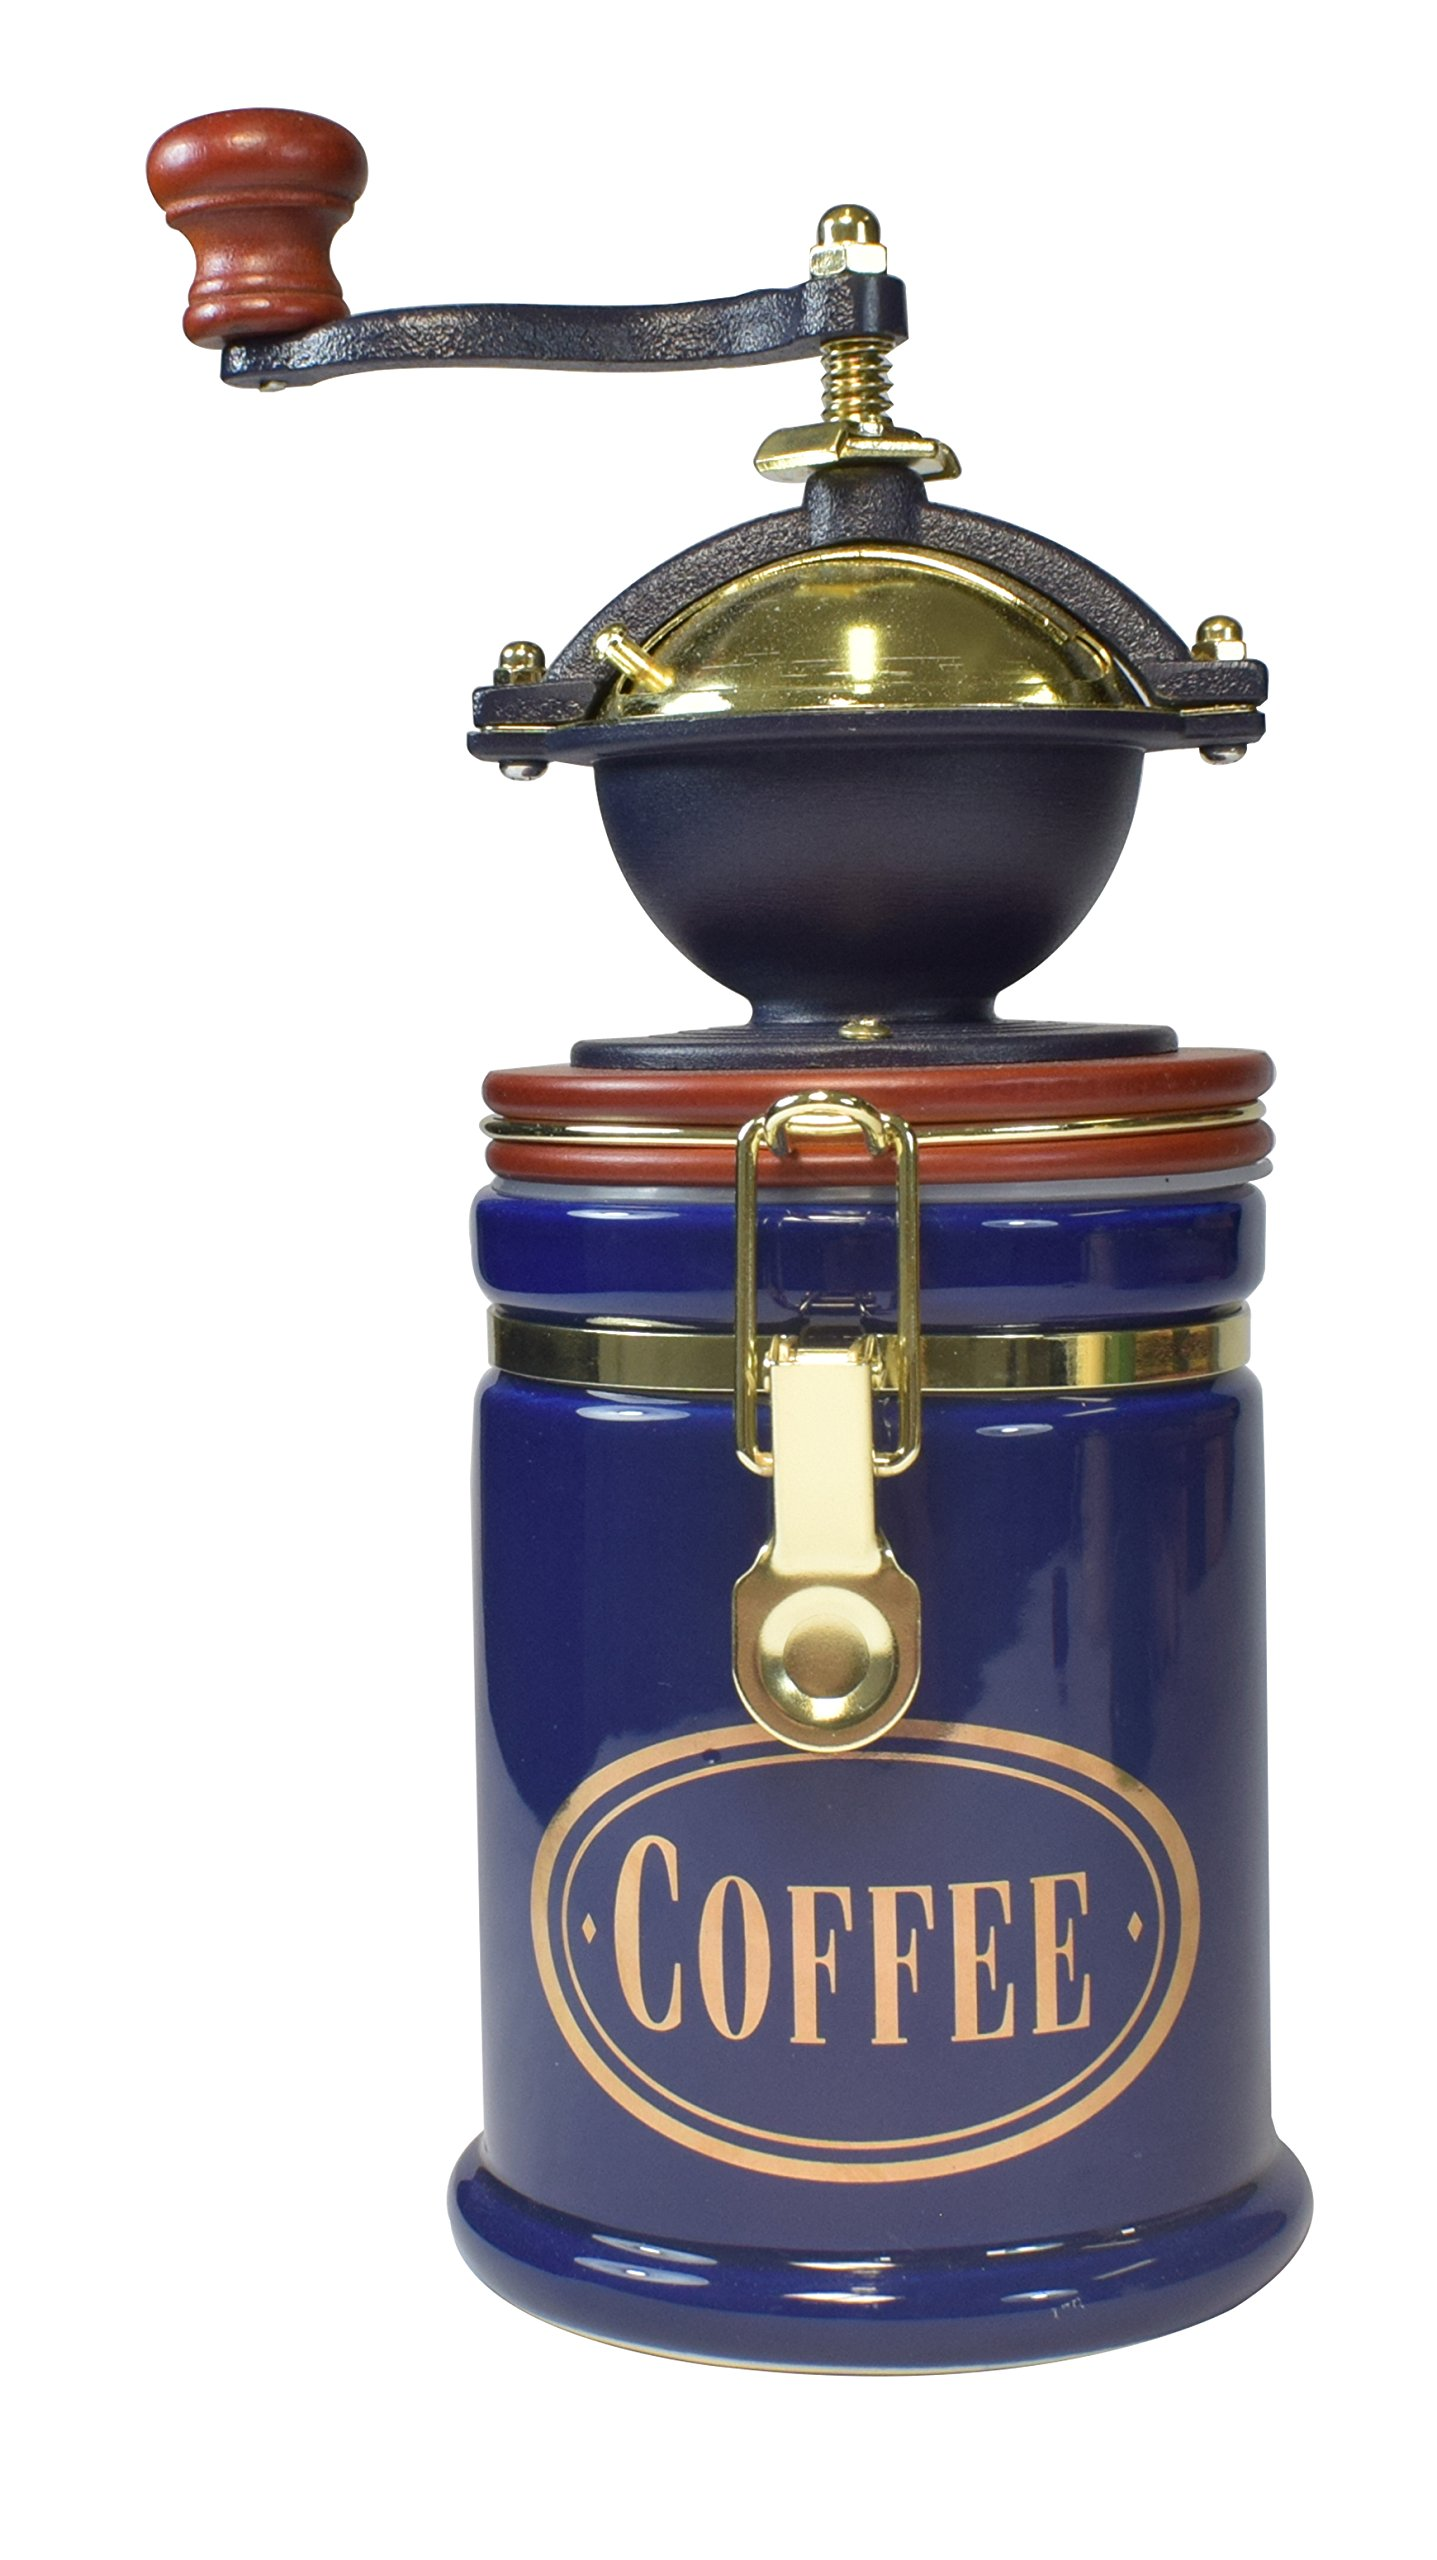 Bisetti 62026 Volluto Coffee Grinder, Blue by bisetti